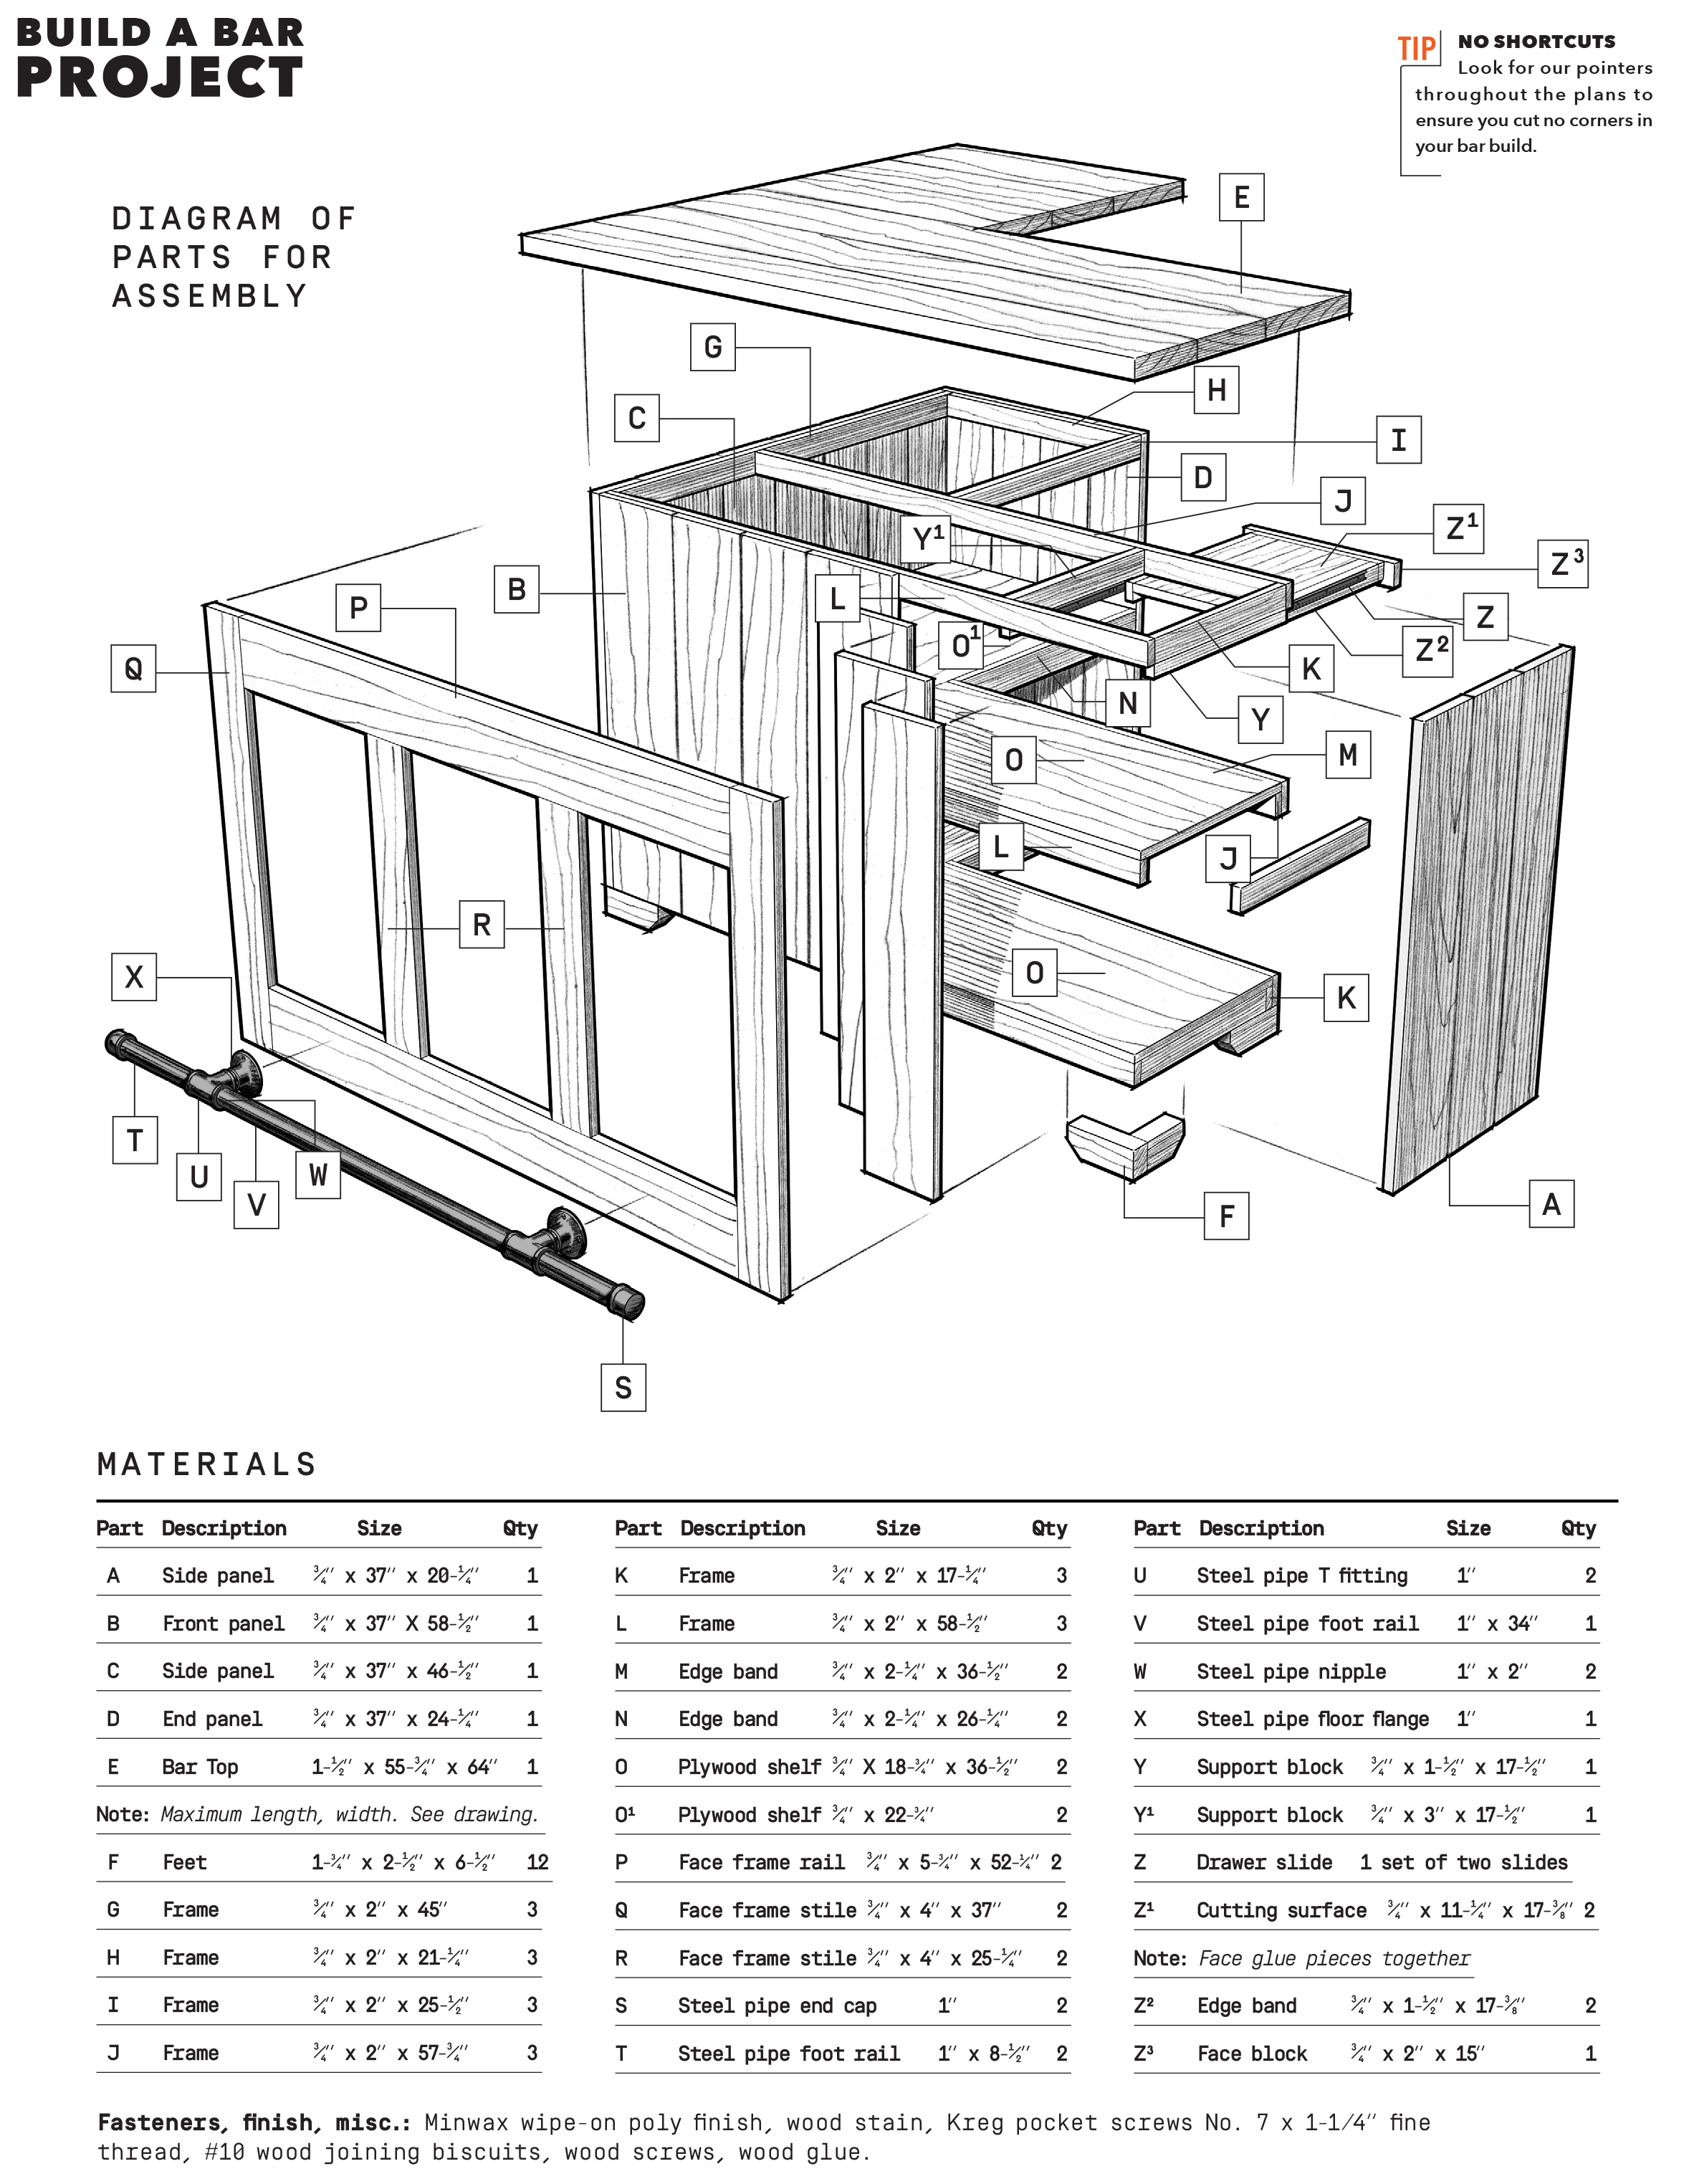 Key - Materials List